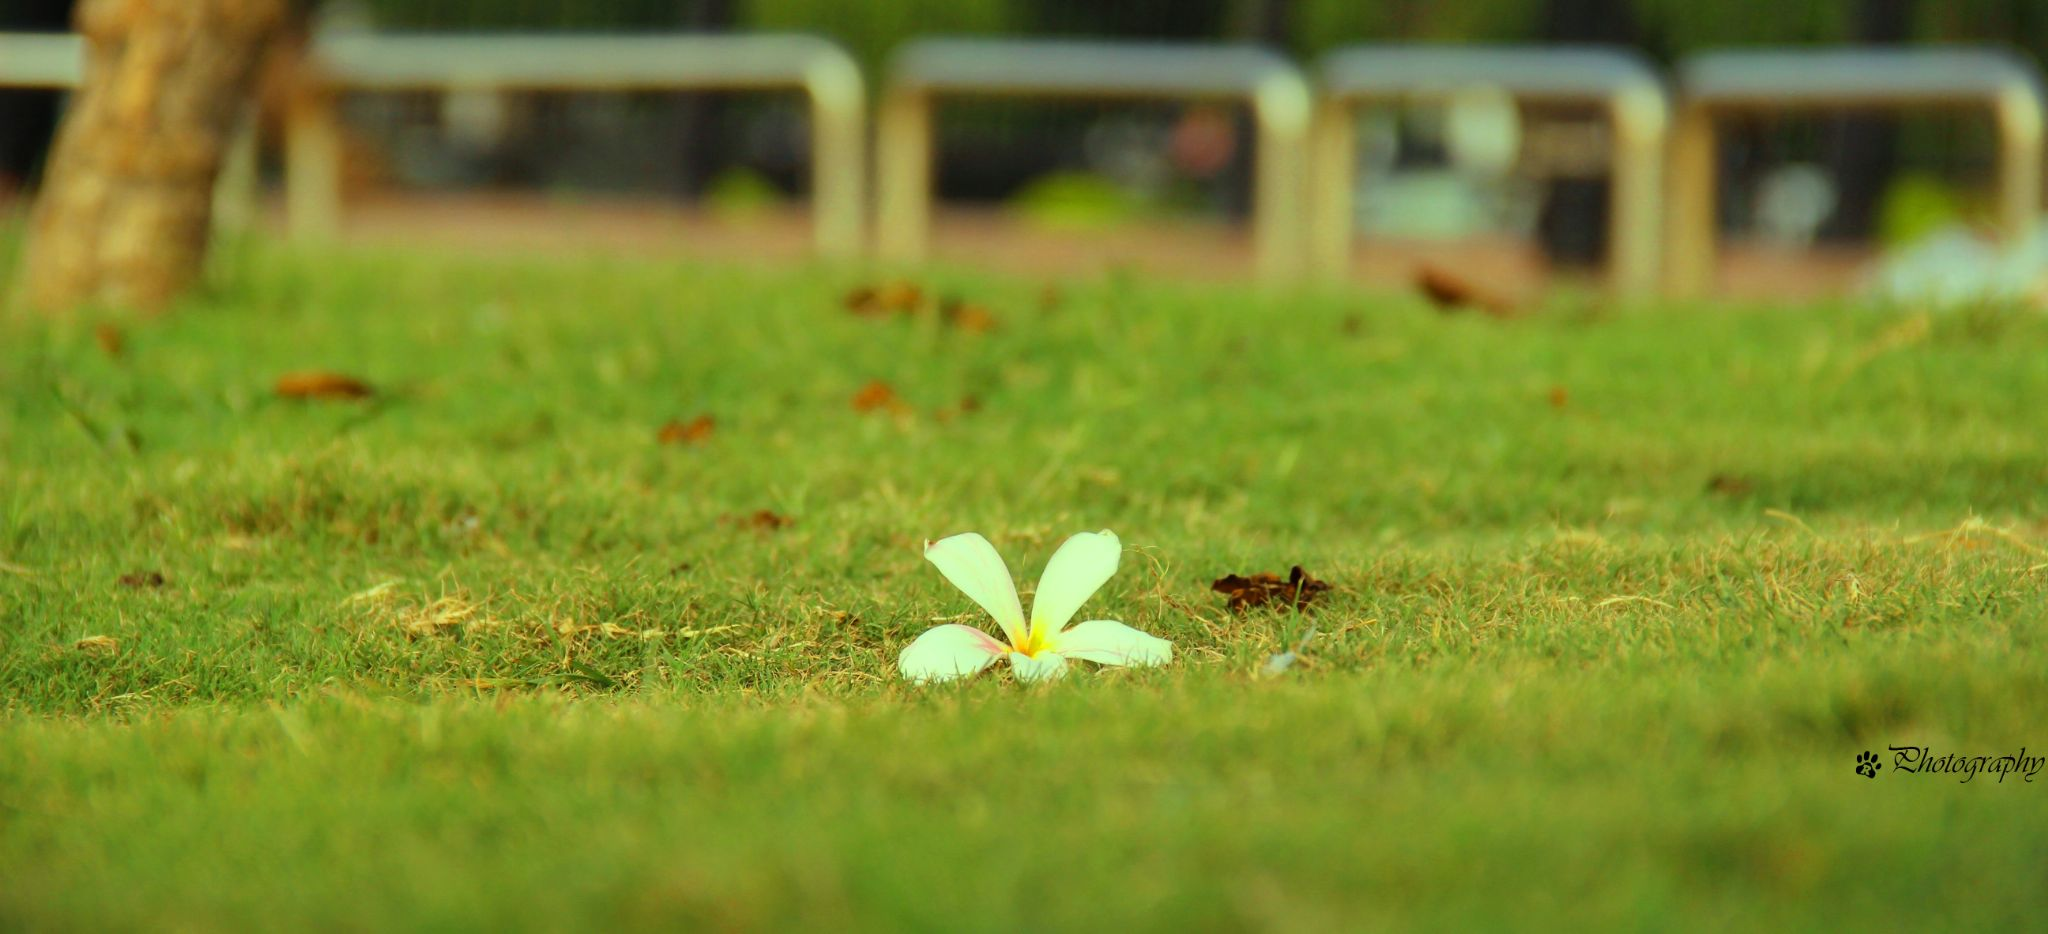 Be always blooming by imRohitSingh